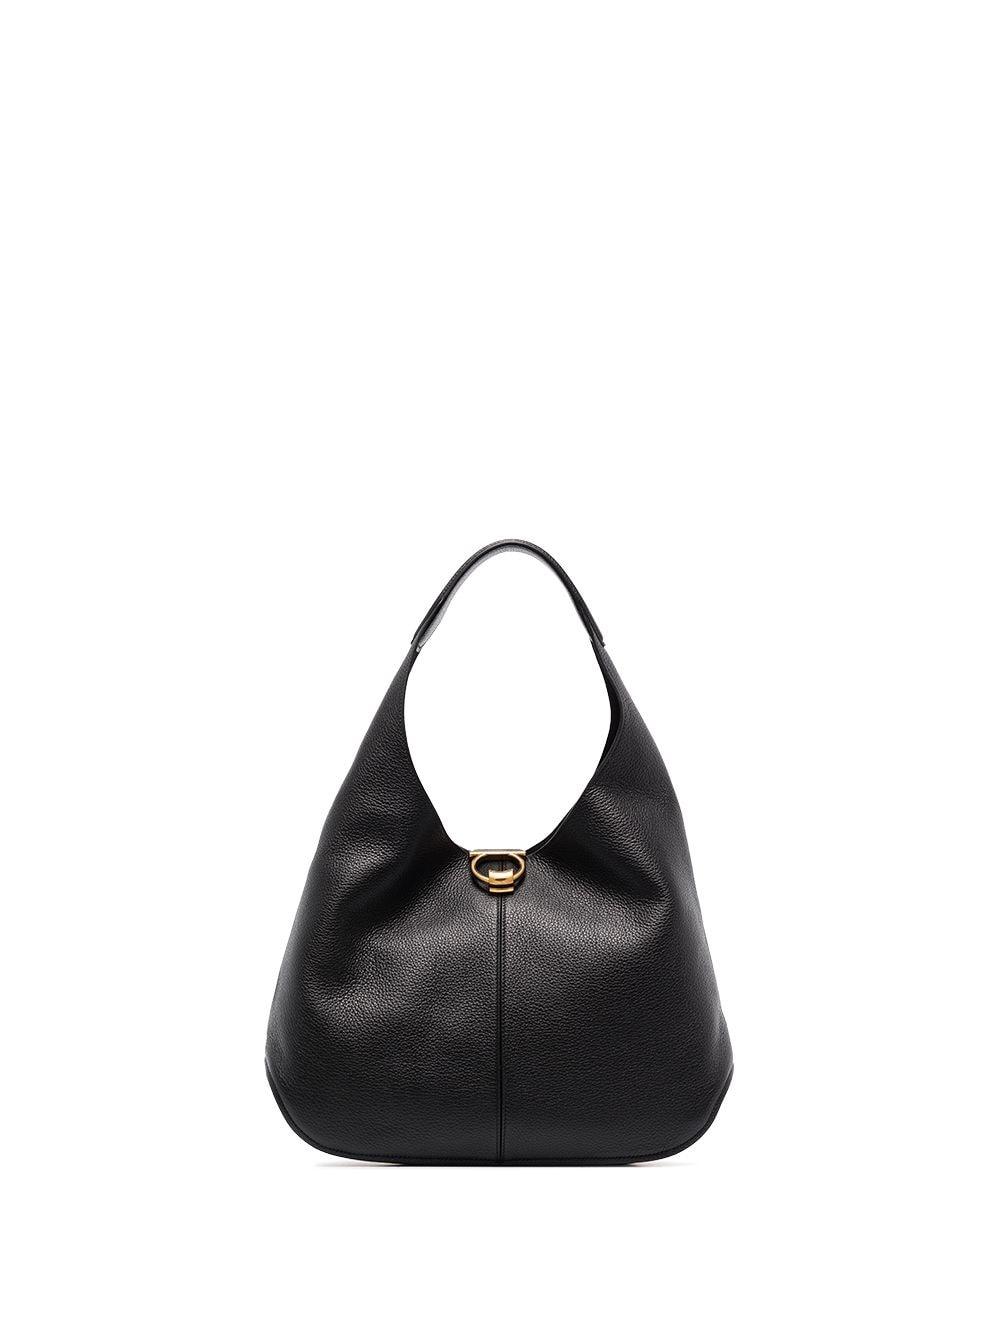 Picture of Ferragamo   Small Gancini Shoulder Bag